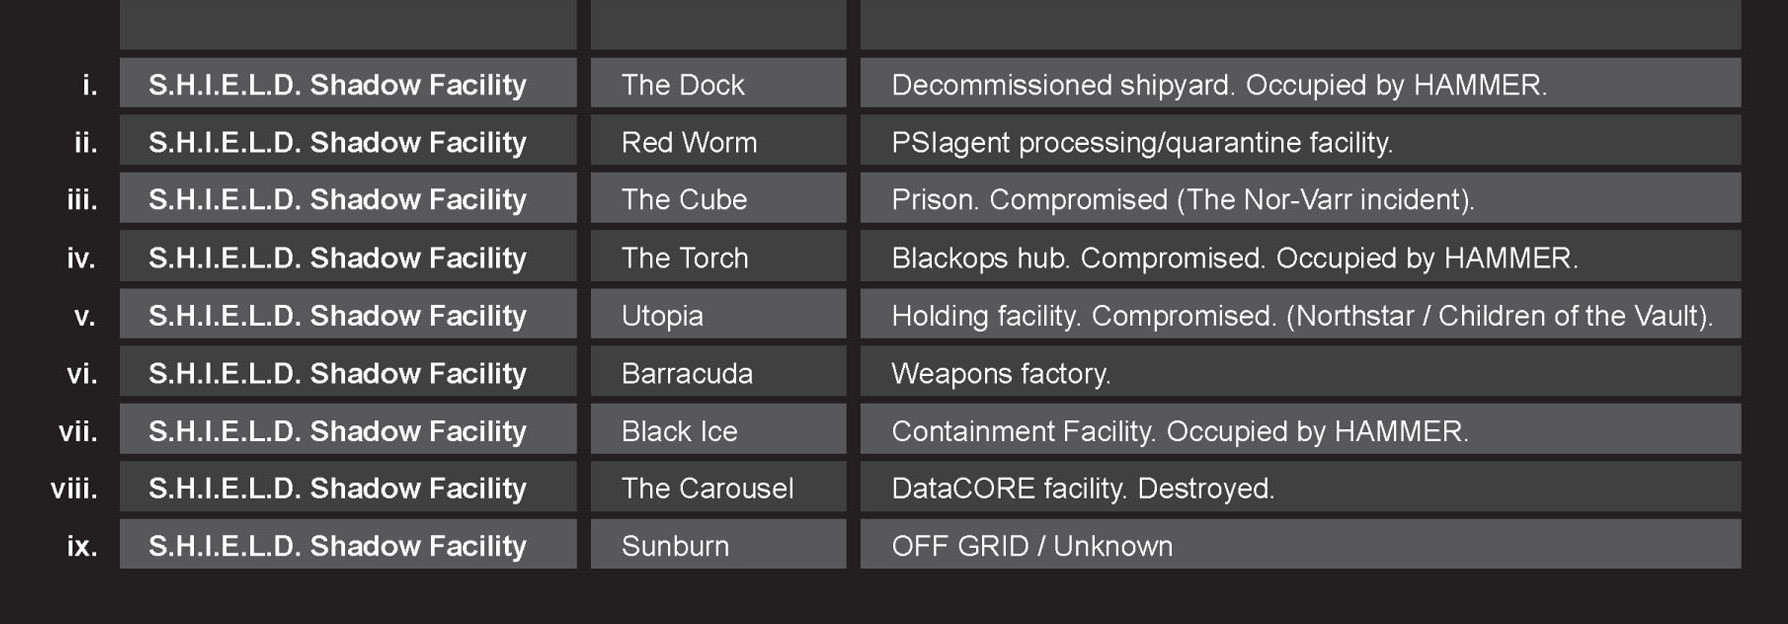 Barracuda (S.H.I.E.L.D. Location)/Gallery